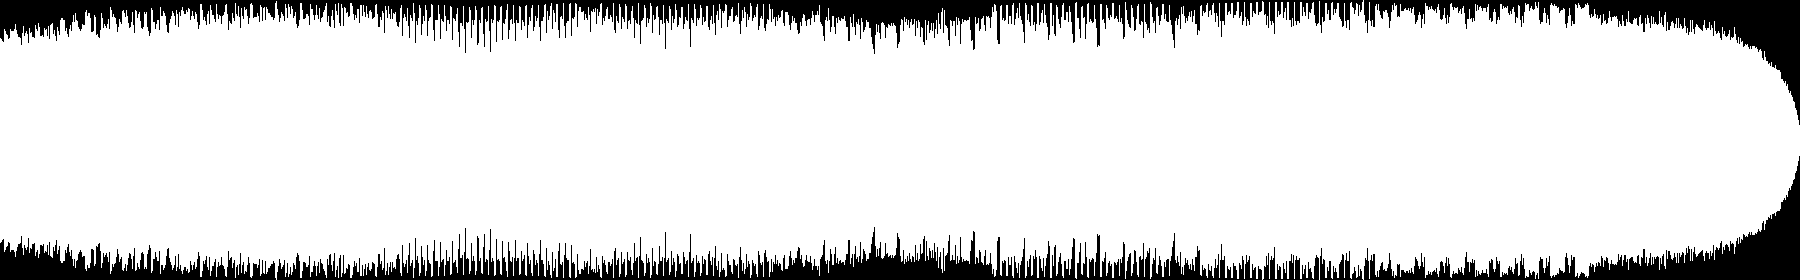 Portal audio waveform